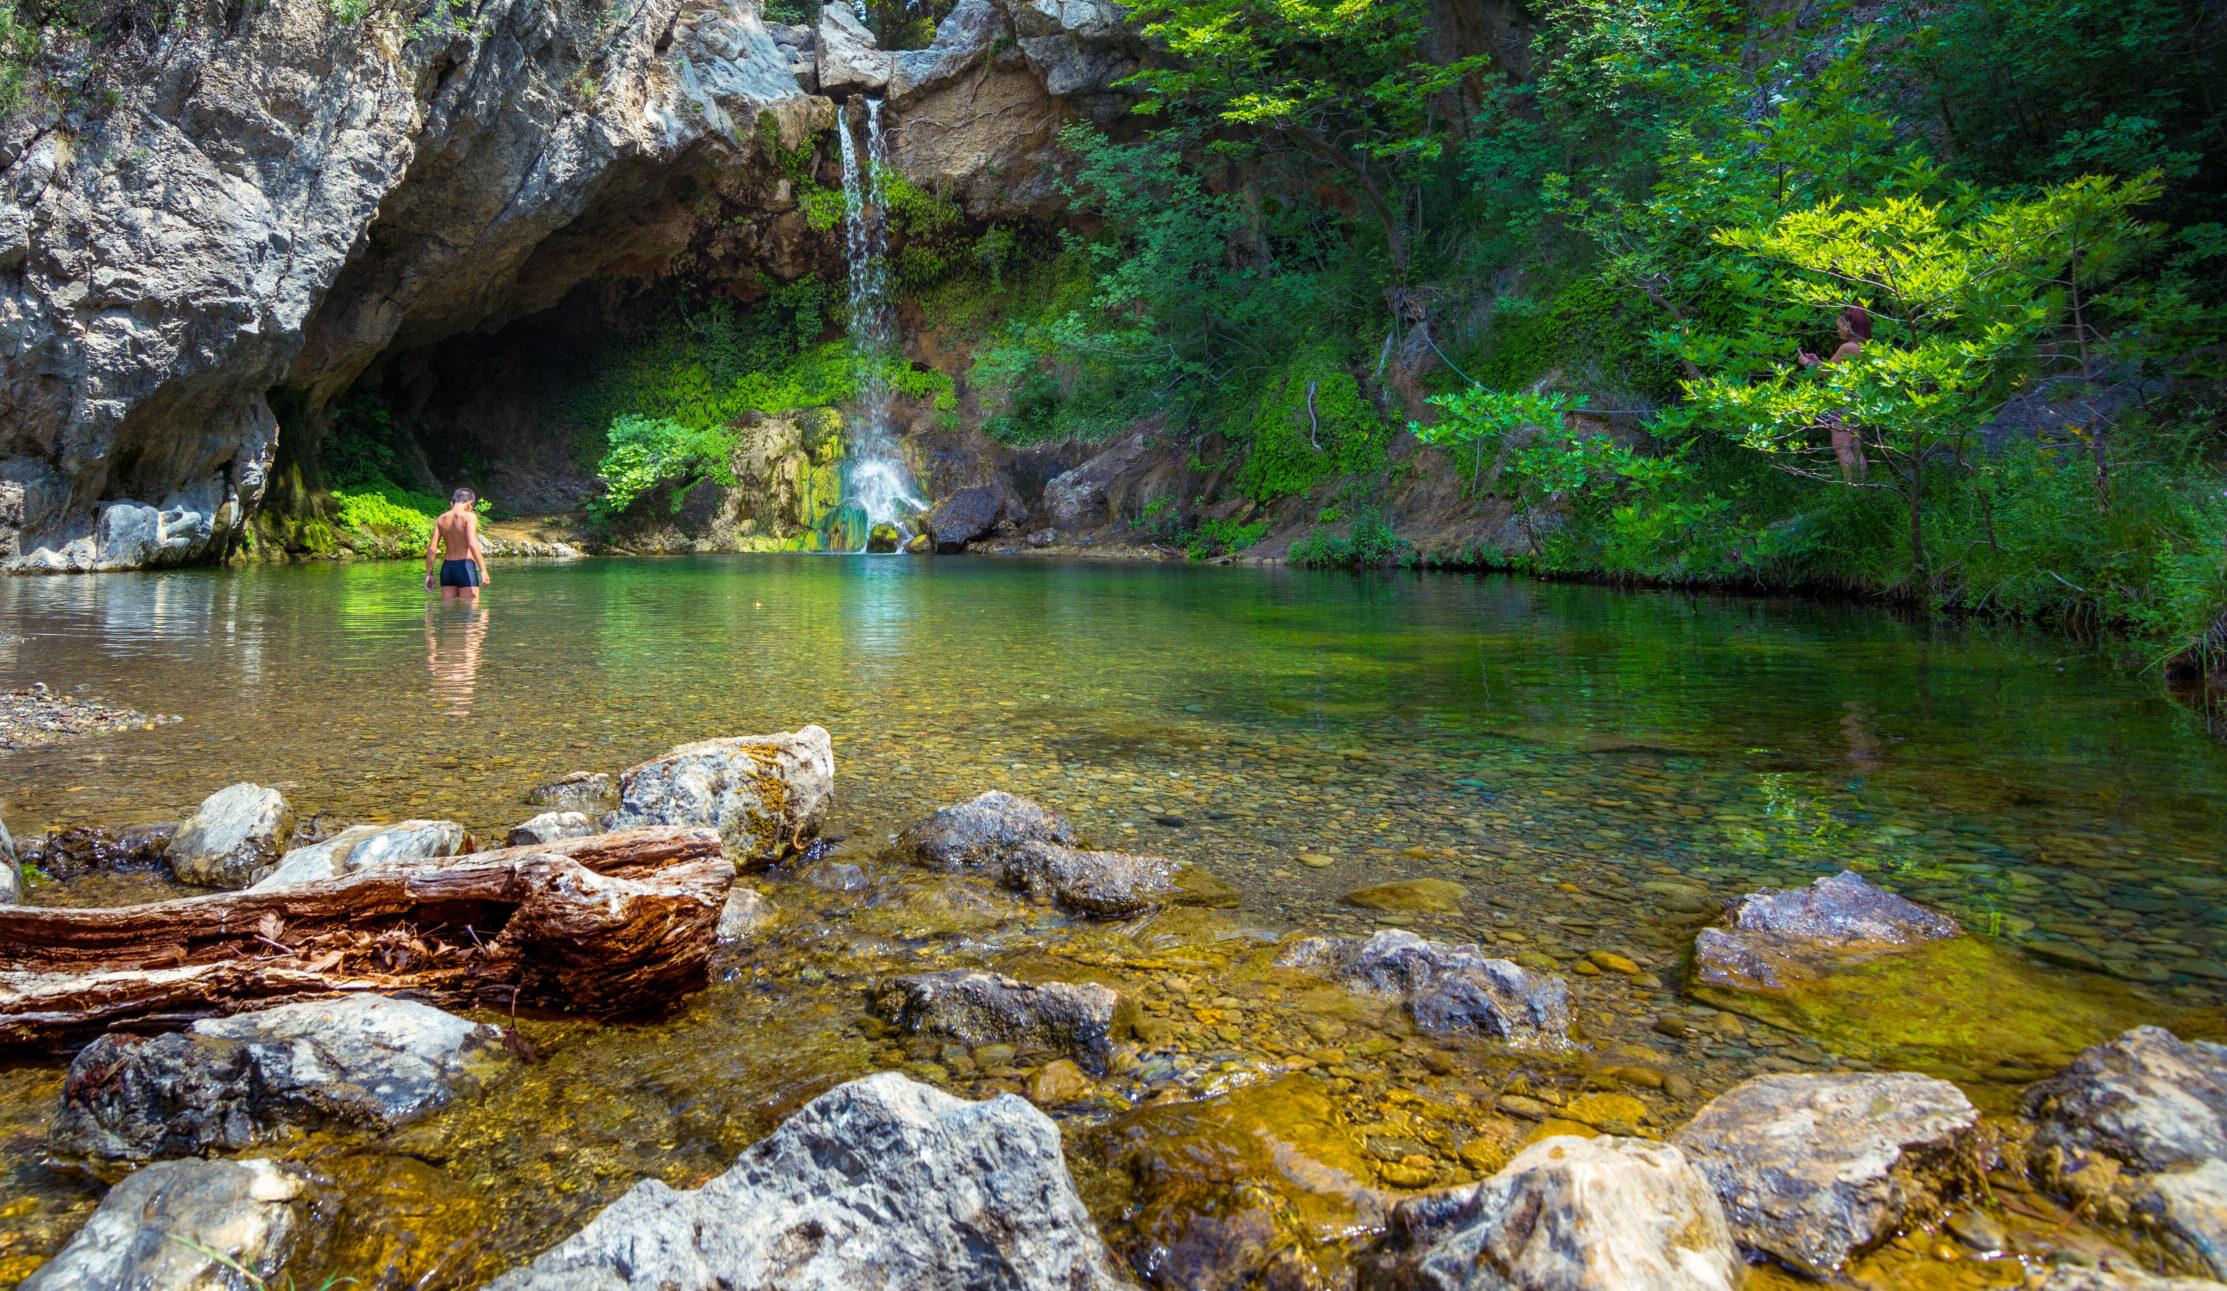 Drymonas, a perfect destination for a day trip